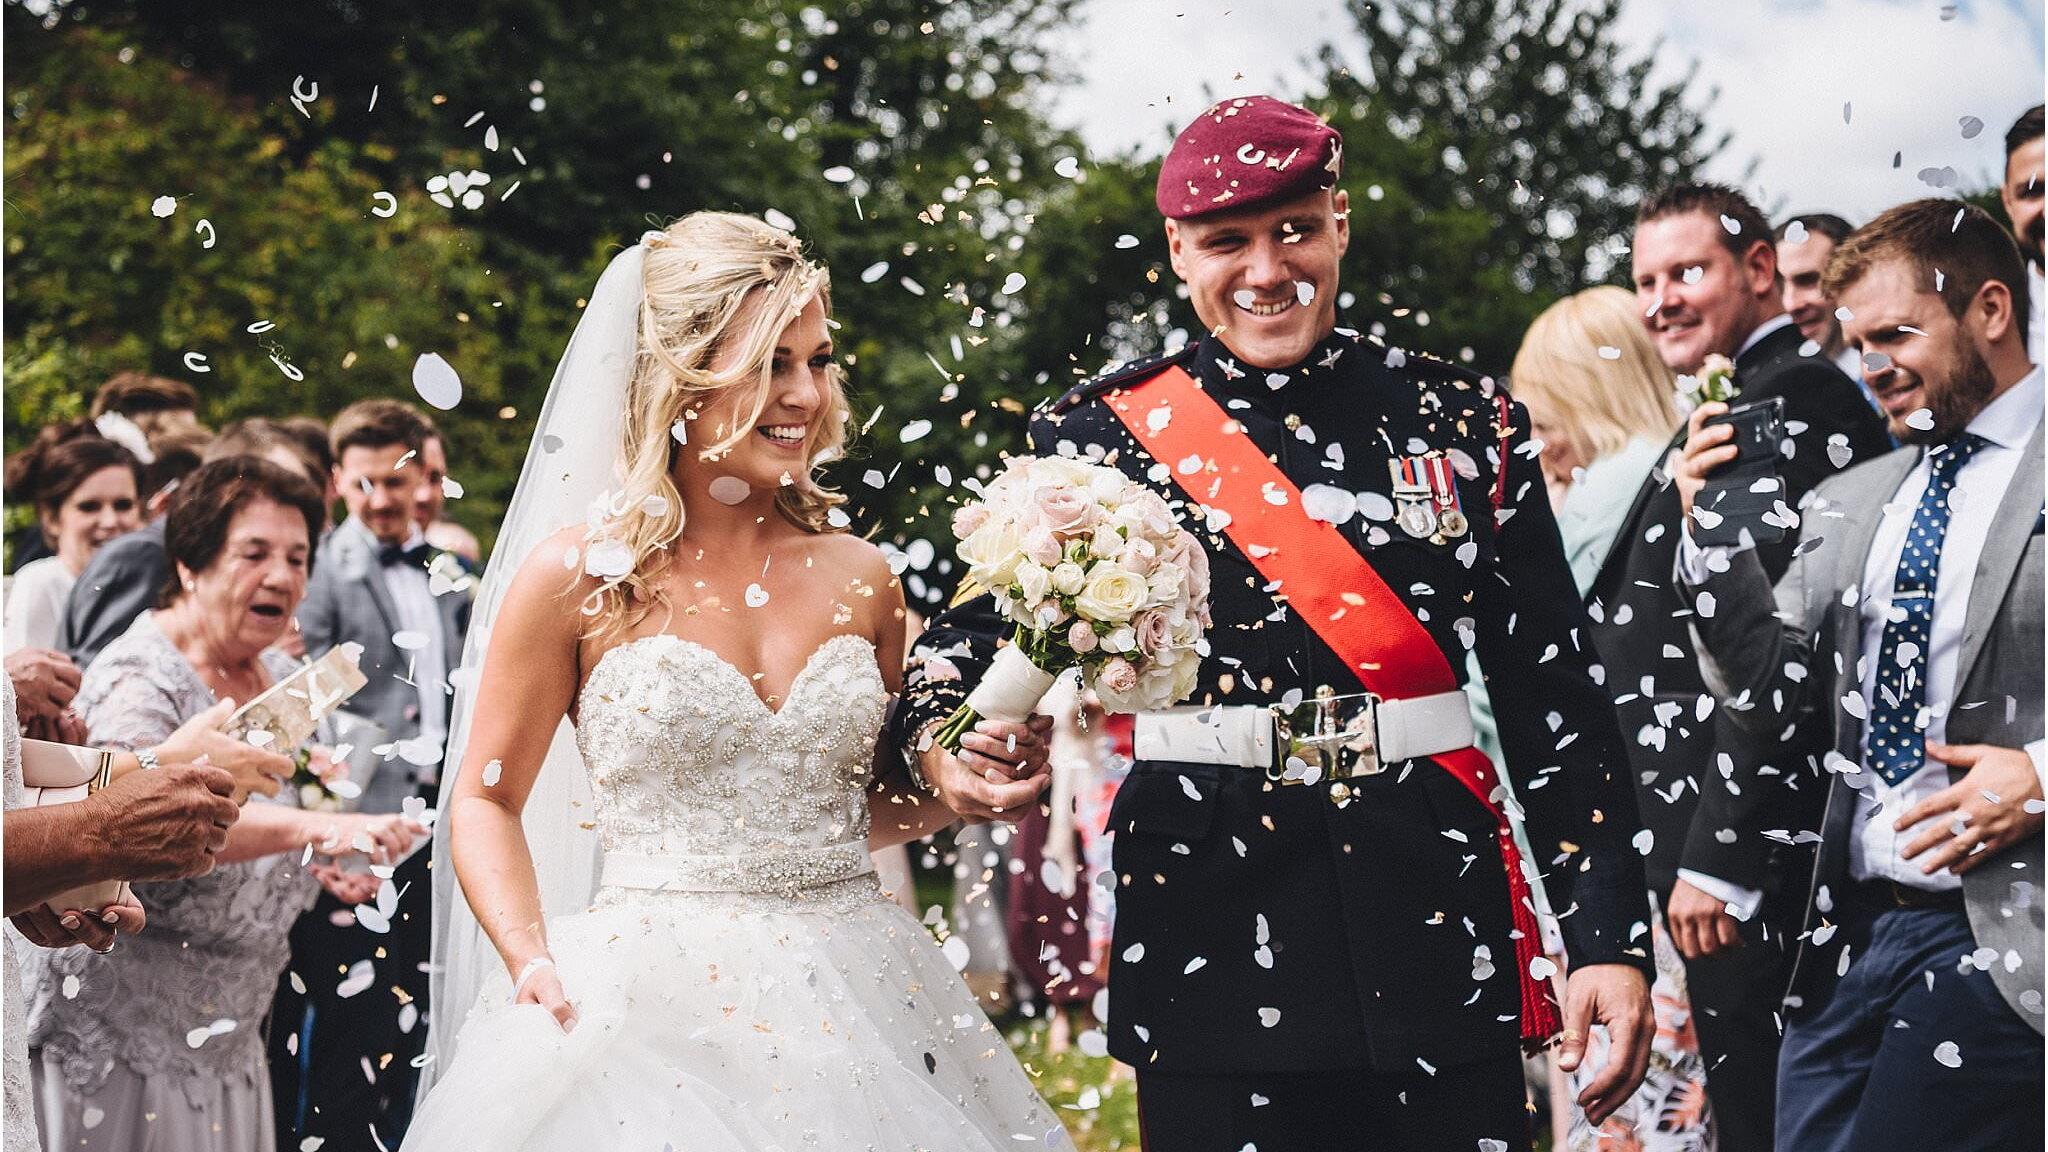 How Caple Court wedding photography